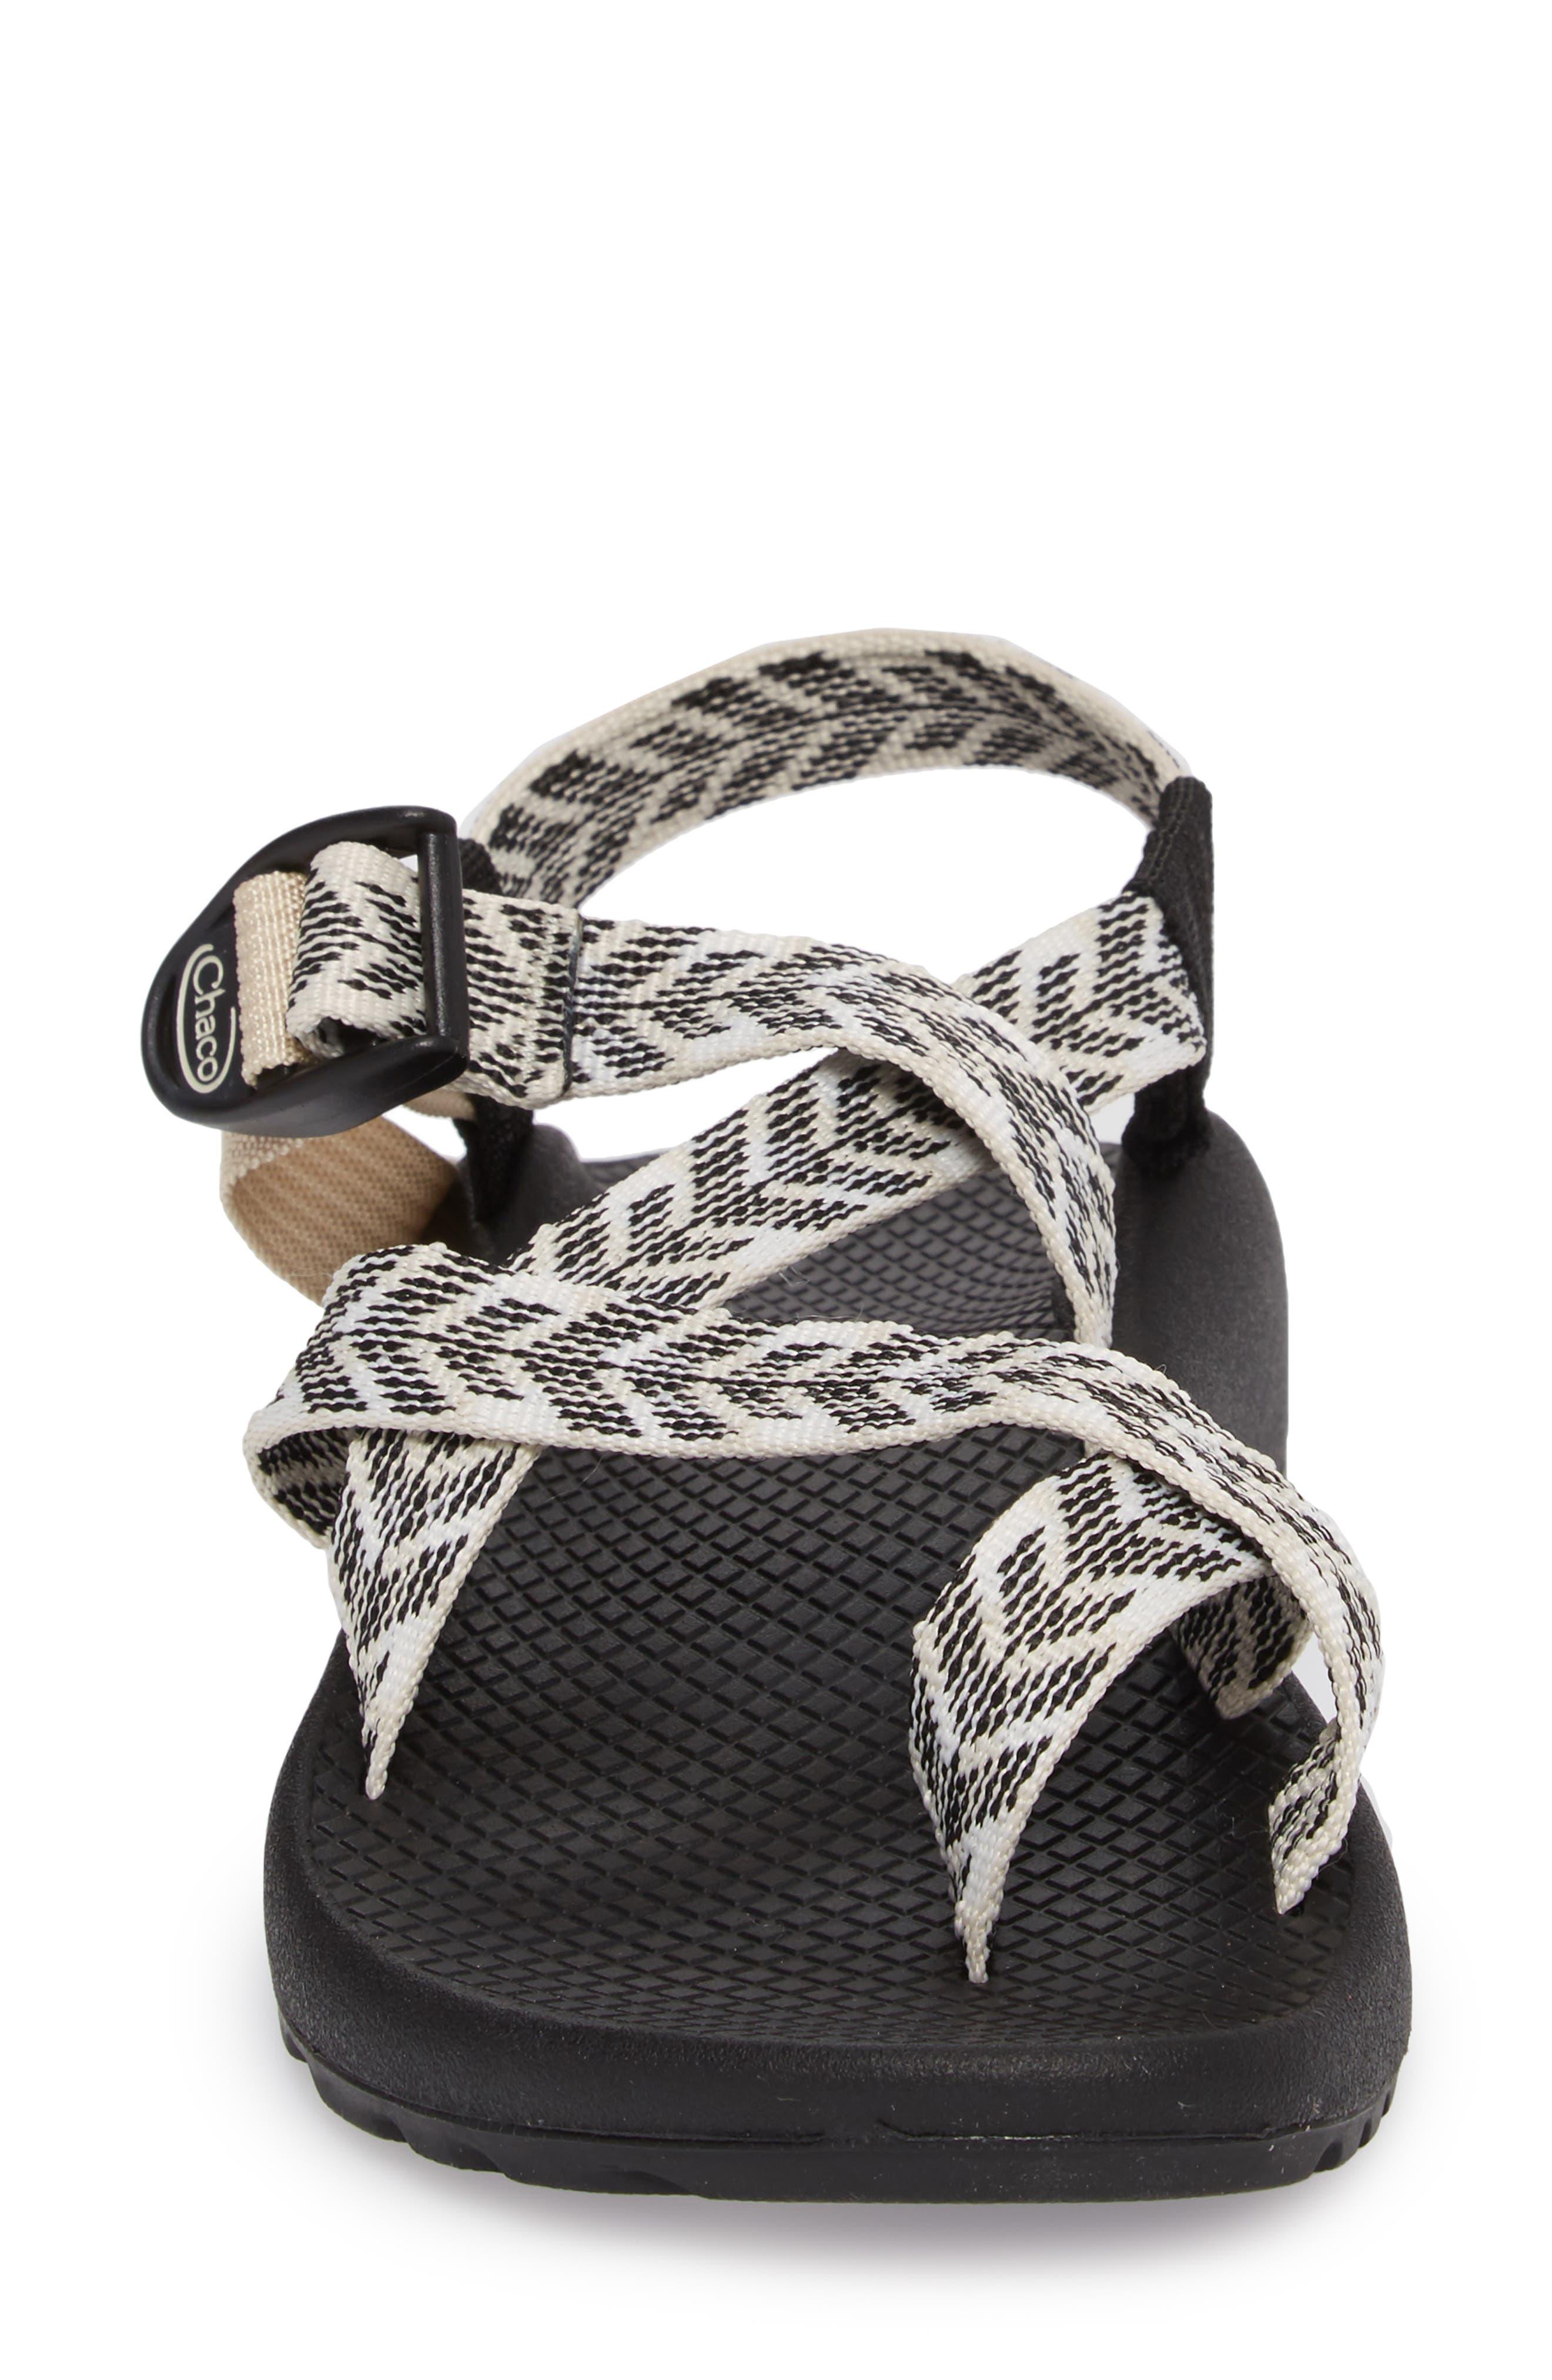 Z/2 Classic Sport Sandal,                             Alternate thumbnail 4, color,                             TRINE BLACK / WHITE